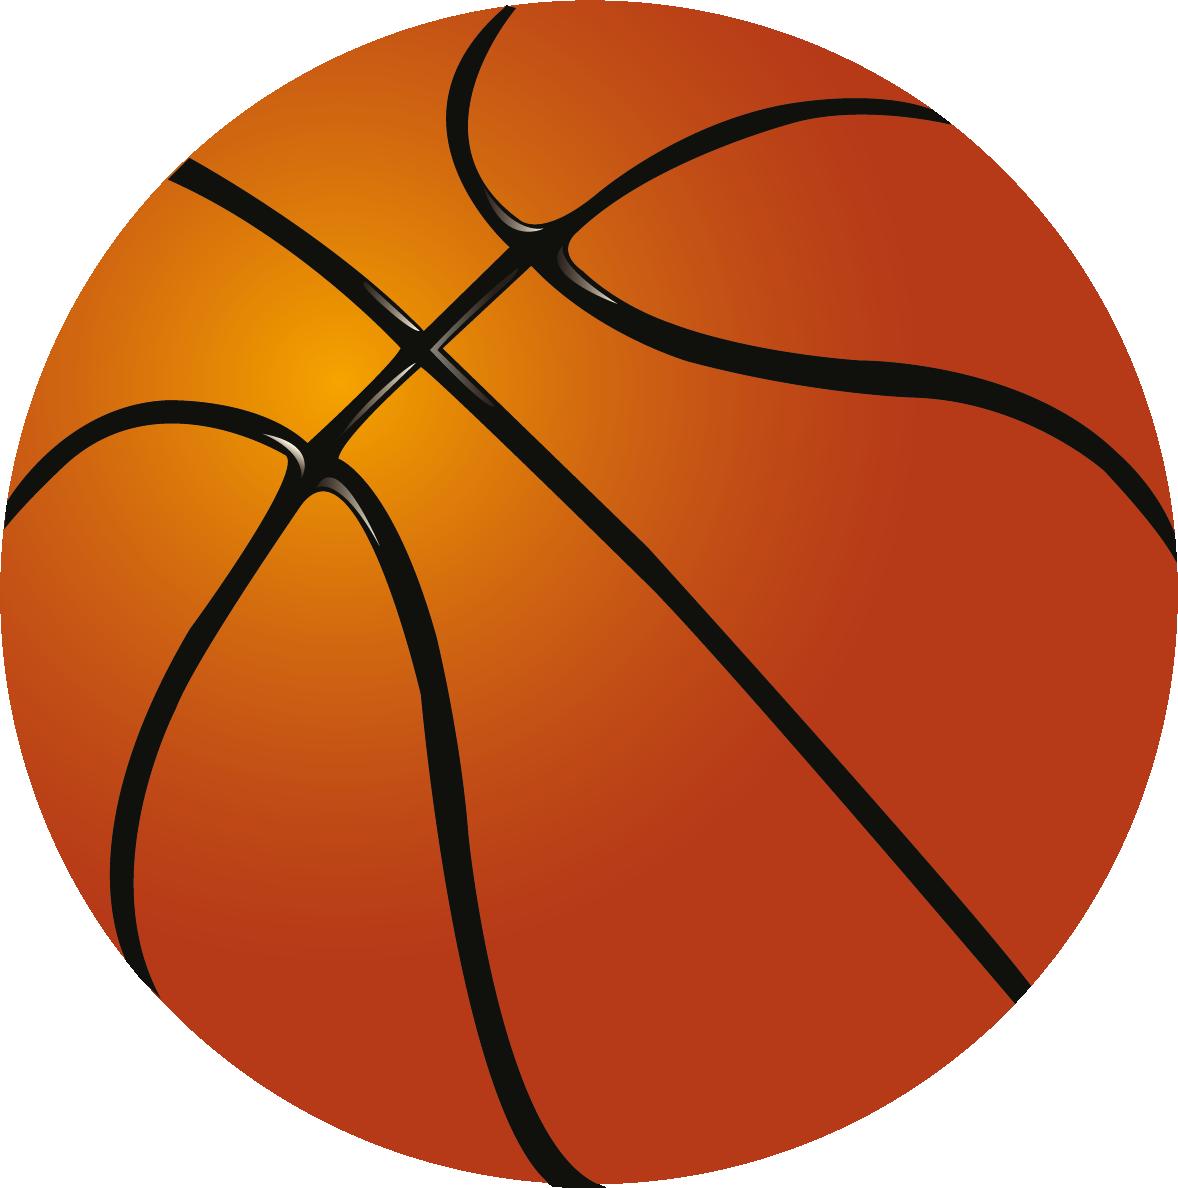 1178x1188 Clip Art Of Basketball Clipart Panda